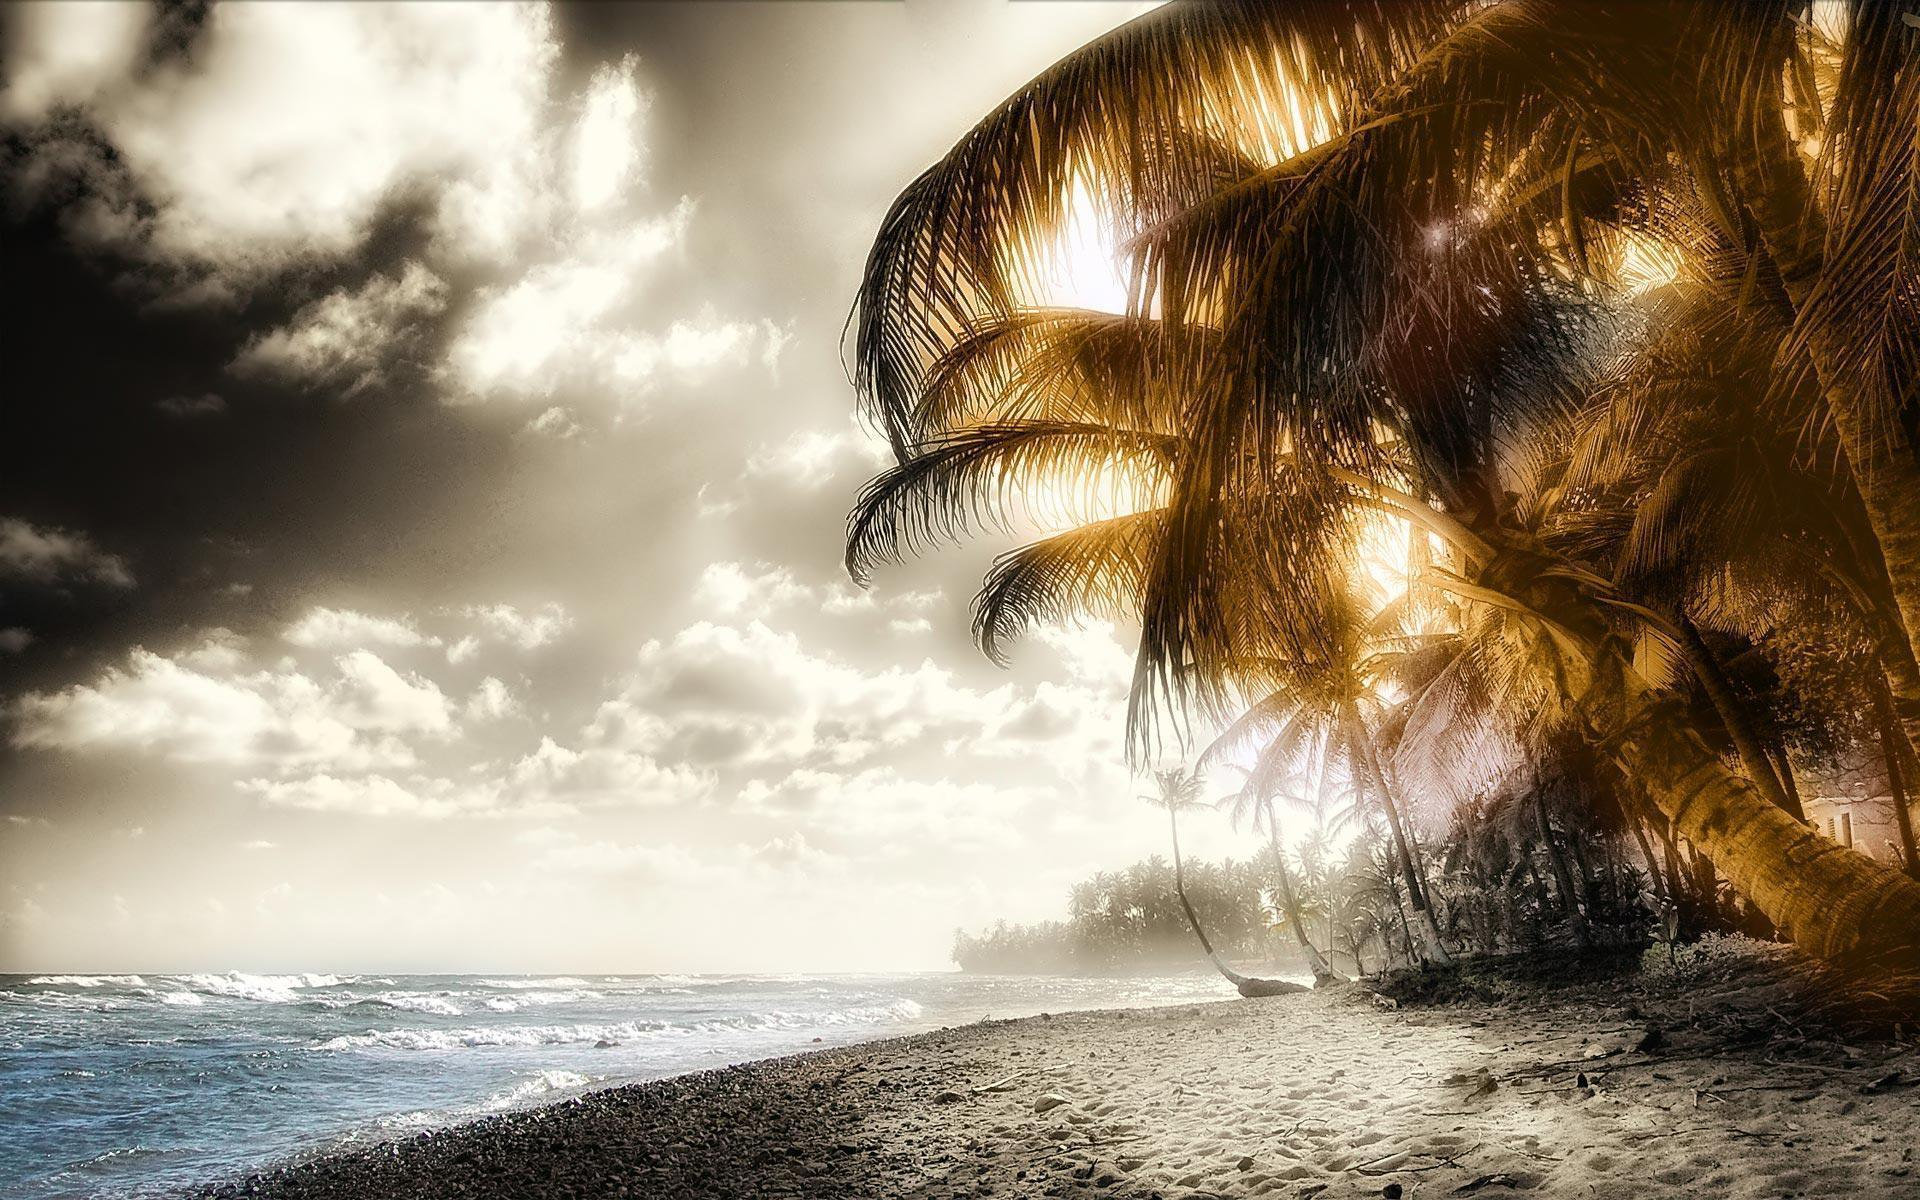 wallpaper seaside wallpapers mlg - photo #43